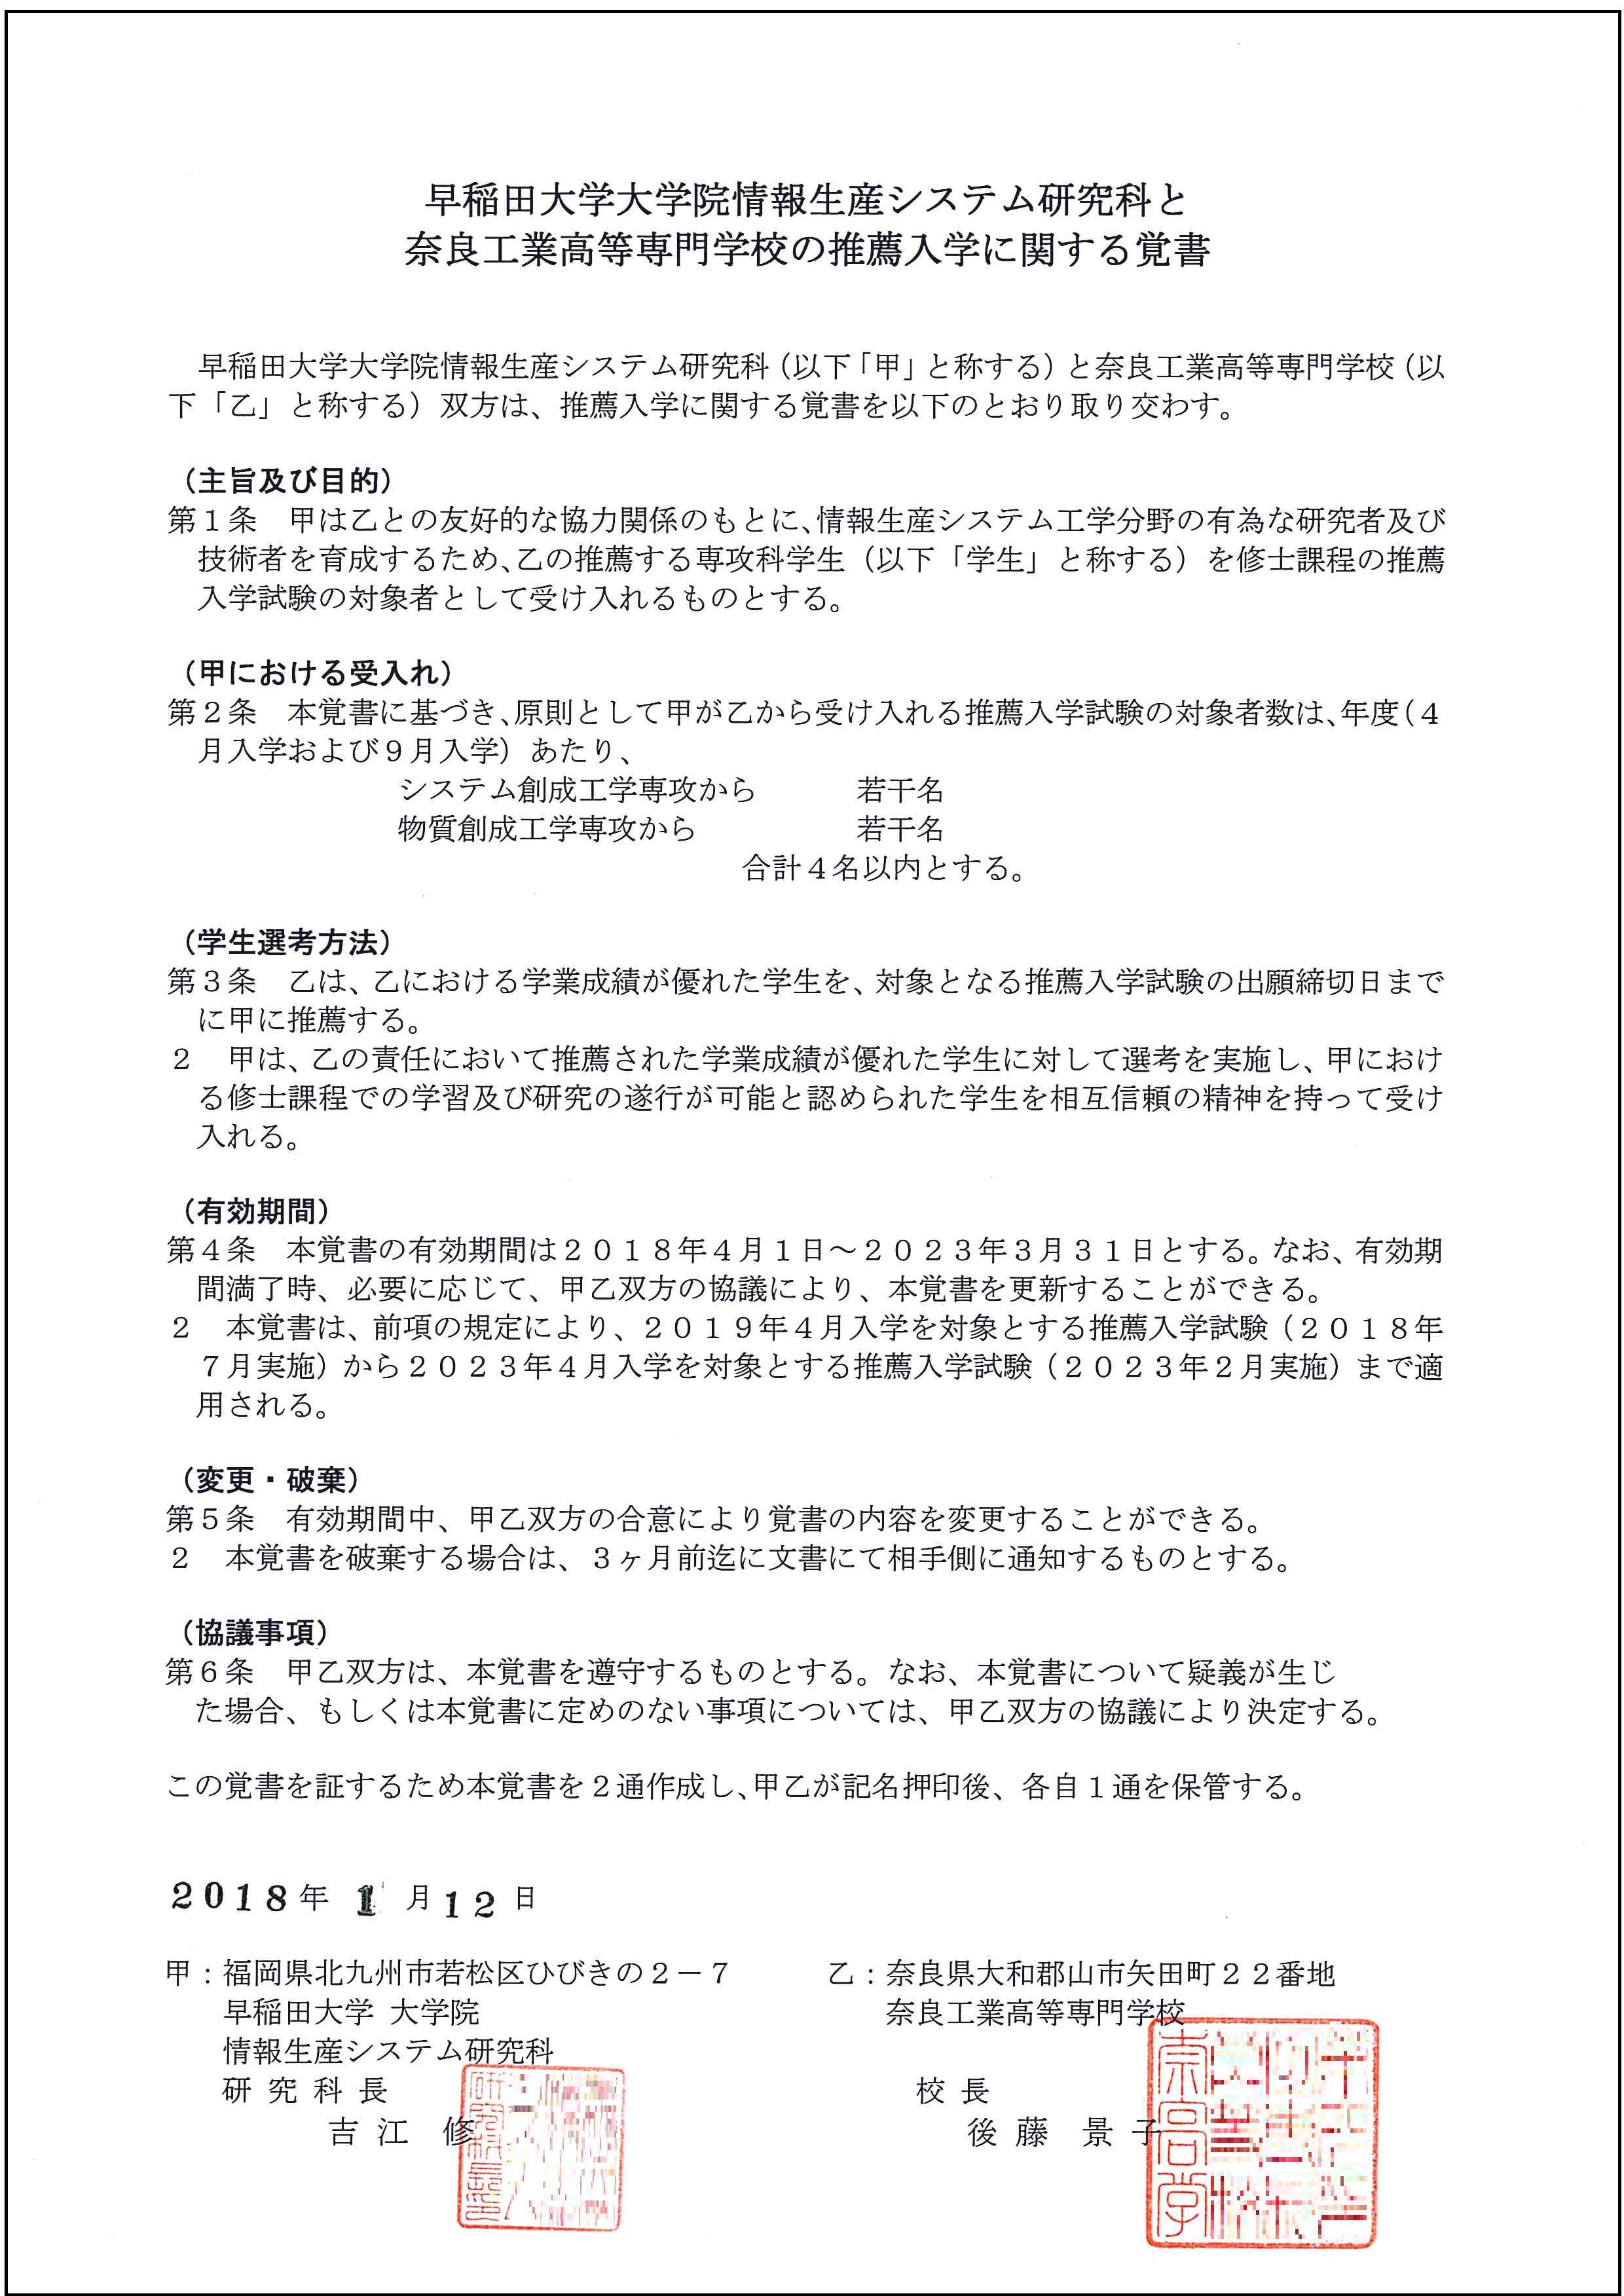 20180401-waseda.jpg